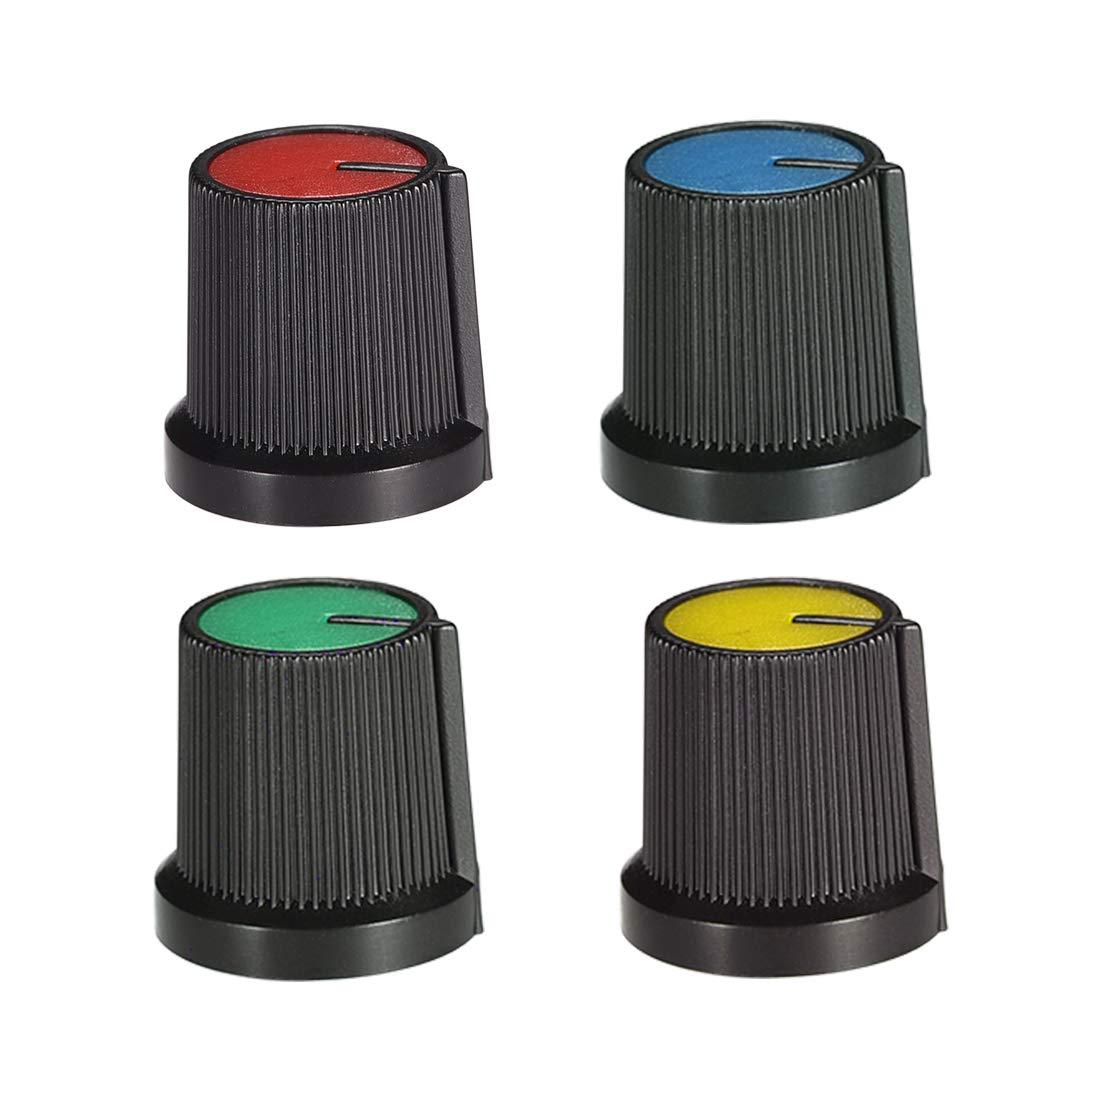 uxcell 10Pcs 6mm Shaft Hole Knob for Speaker Effect Pedal Amplifier Potentiometer Knob